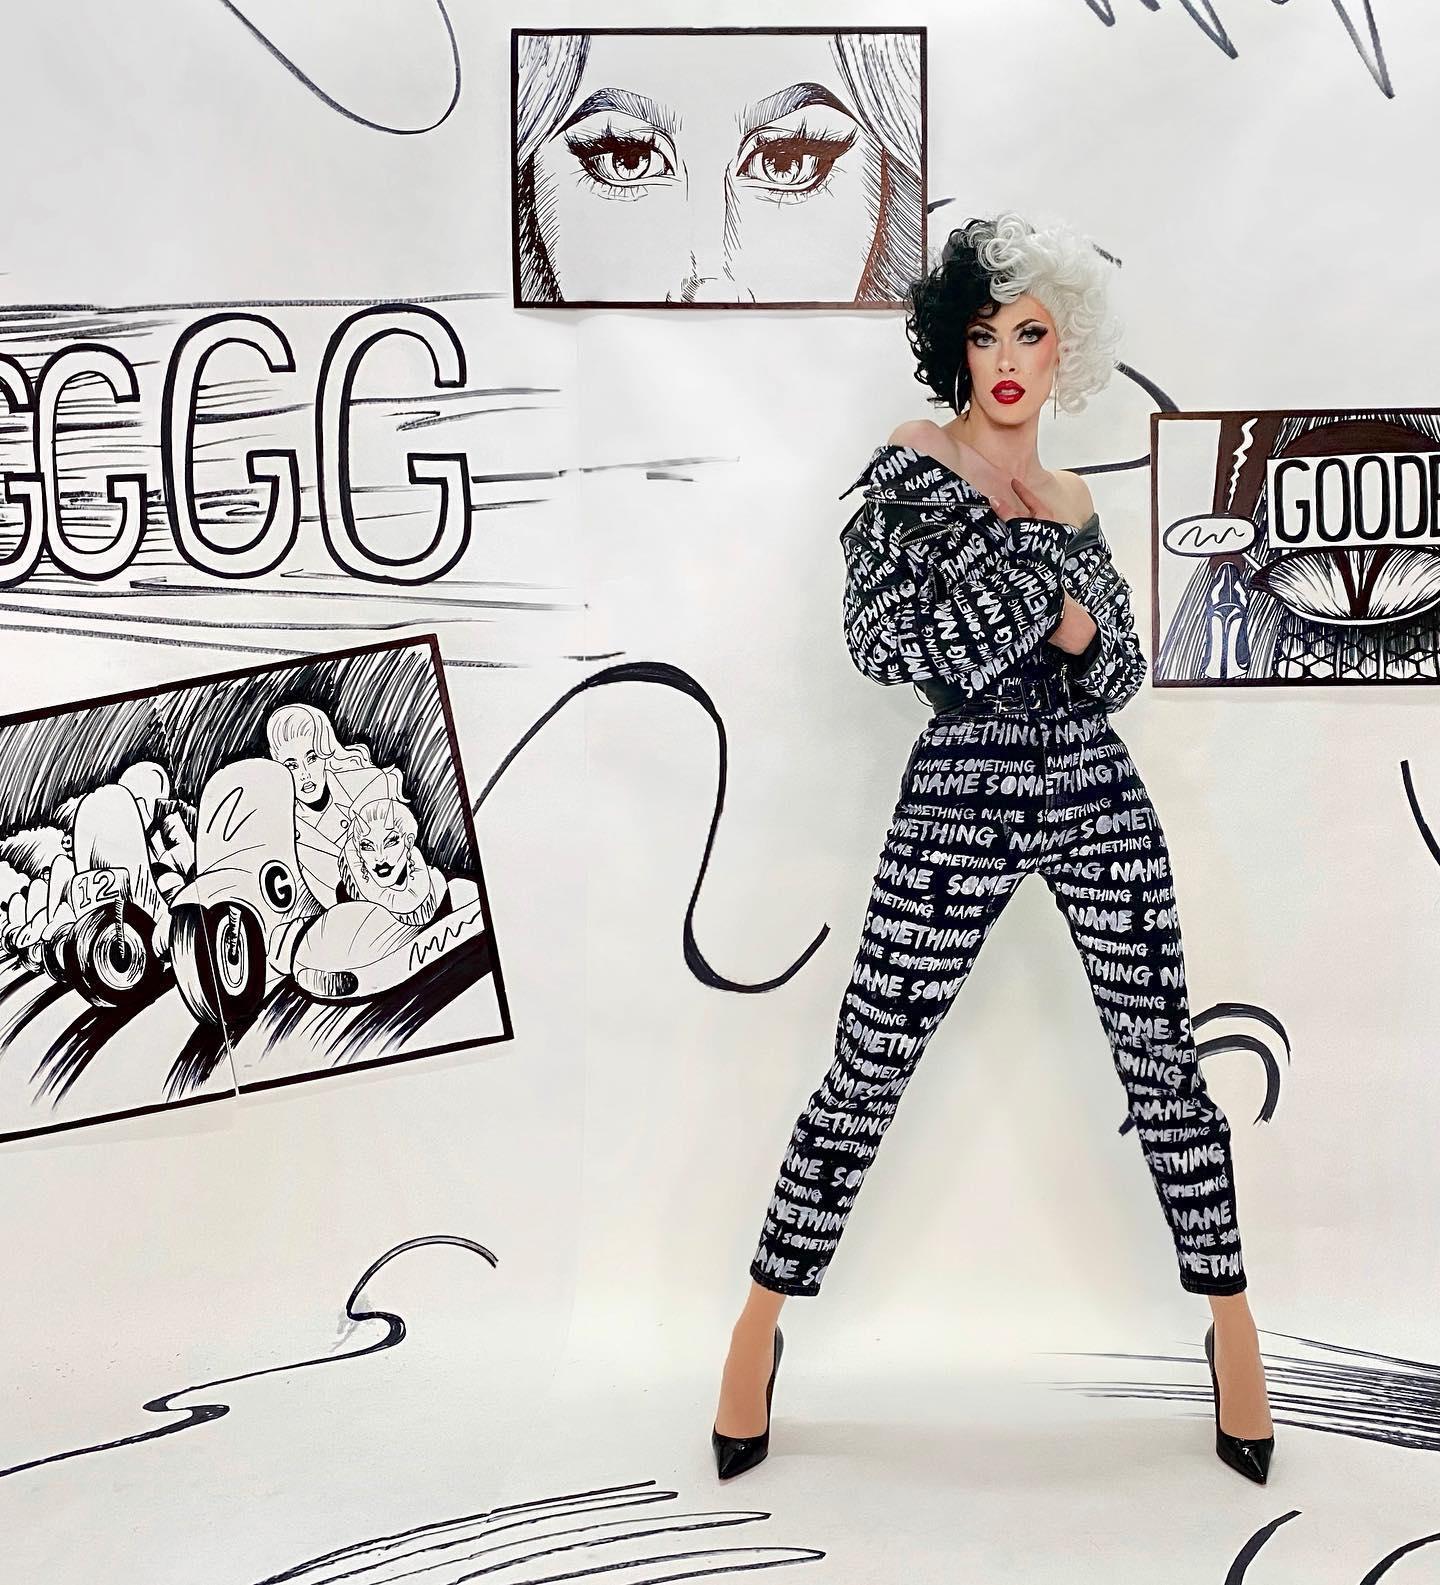 Gigi Goode - Photo by Marko Monroe